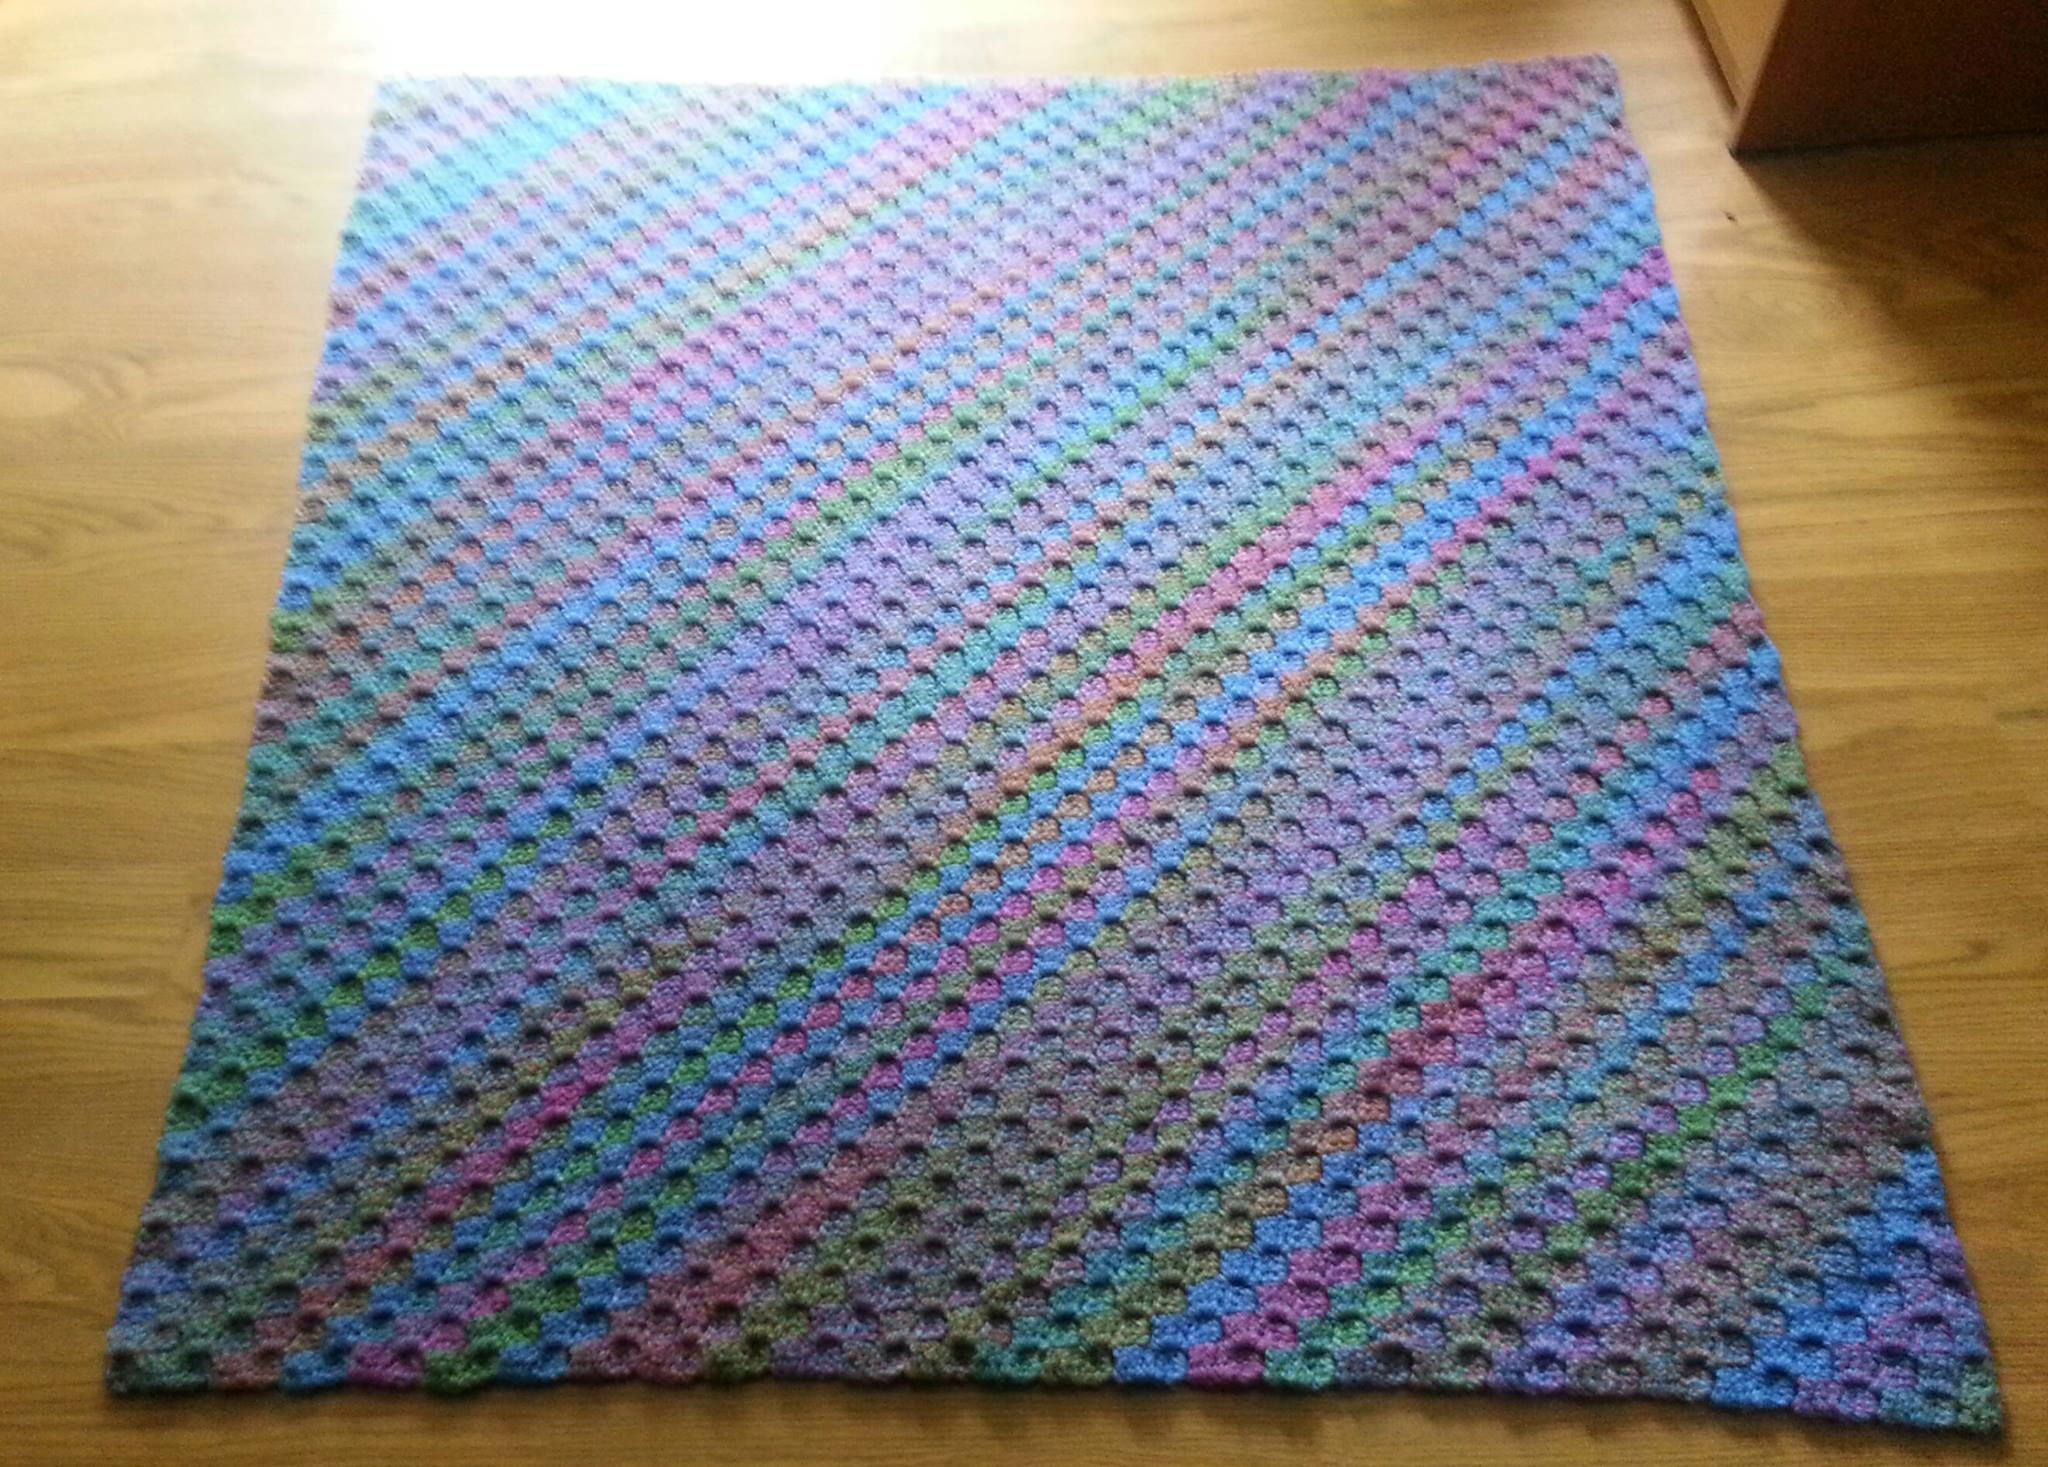 Crochet corner to corner throw crochet pattern httpwww crochet corner to corner throw crochet pattern http throw pillowsscalered heart bankloansurffo Choice Image